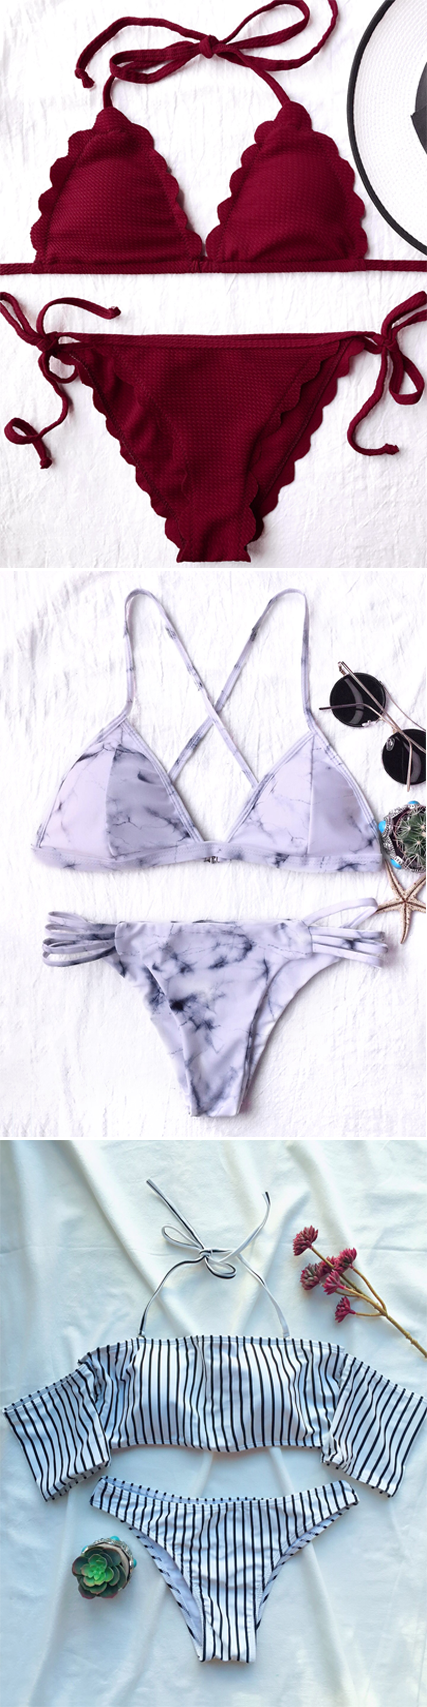 Swimwear in Zaful |swimsuits,bathing suit,bikini,bikini set,one pieces,swimwear 2017,beach outfit,bikinis,beach,beach wear,Hawaii,summer bikinis | #Bikini